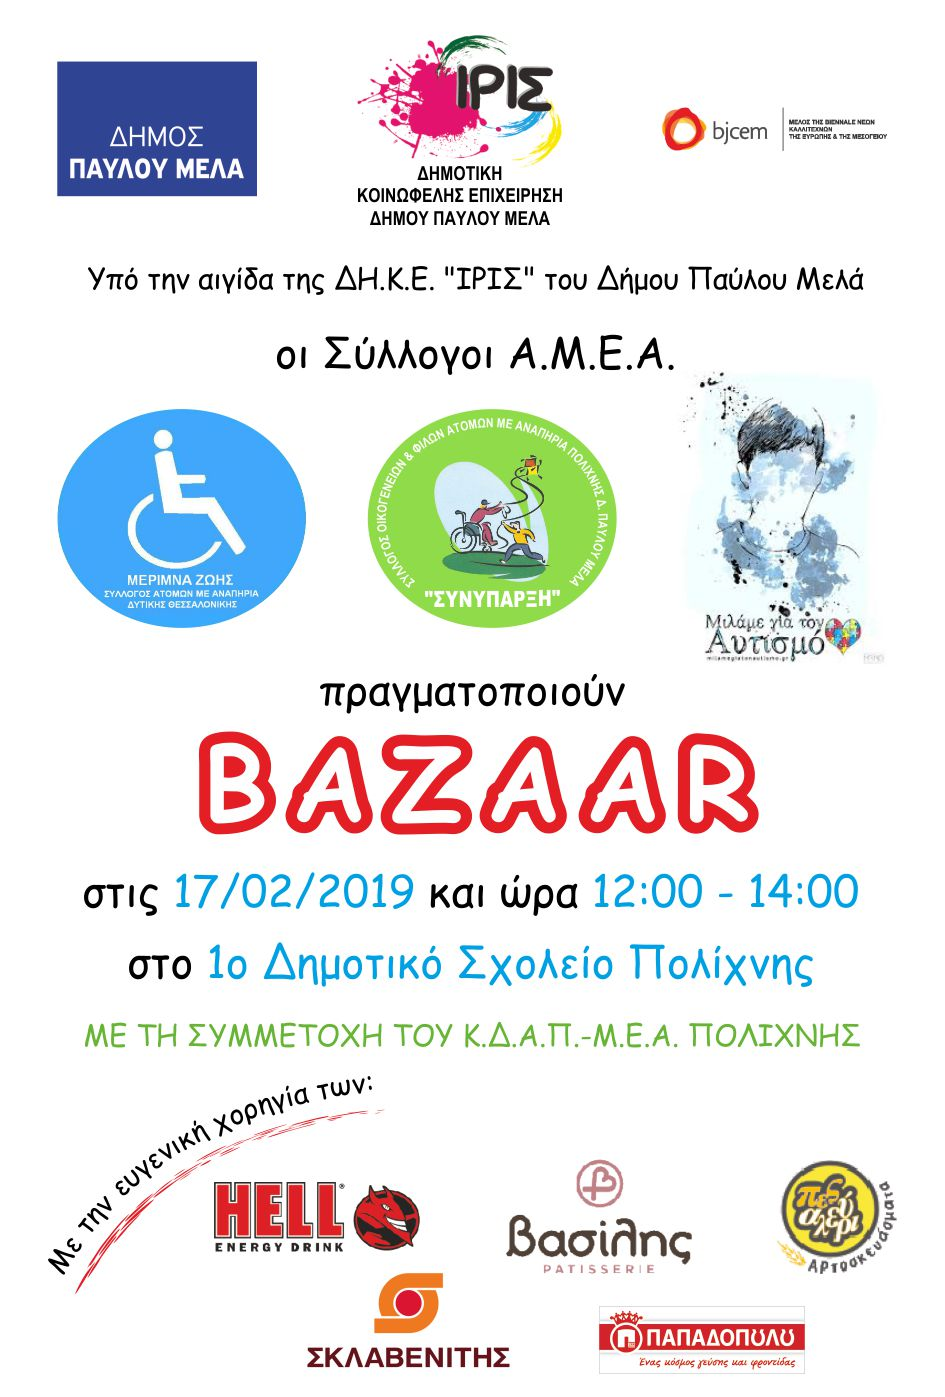 kdap-mea-polichni-bazaar-1